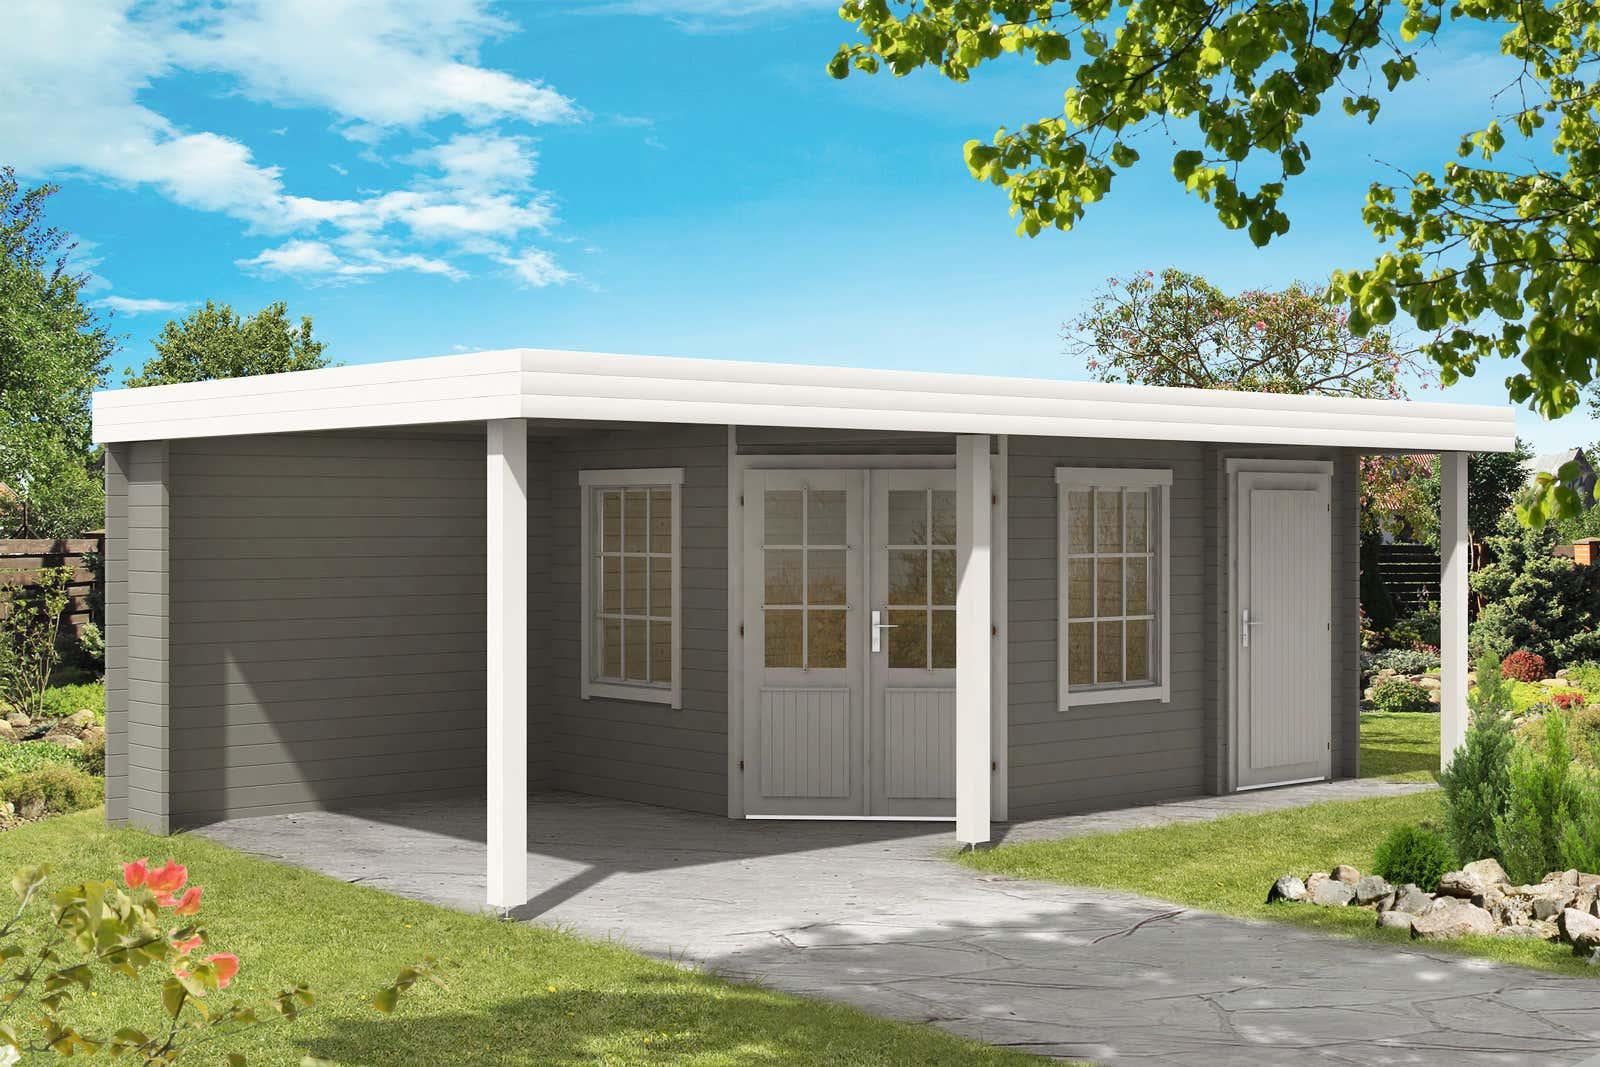 gartenhaus johanna 40 plus a z gartenhaus gmbh. Black Bedroom Furniture Sets. Home Design Ideas